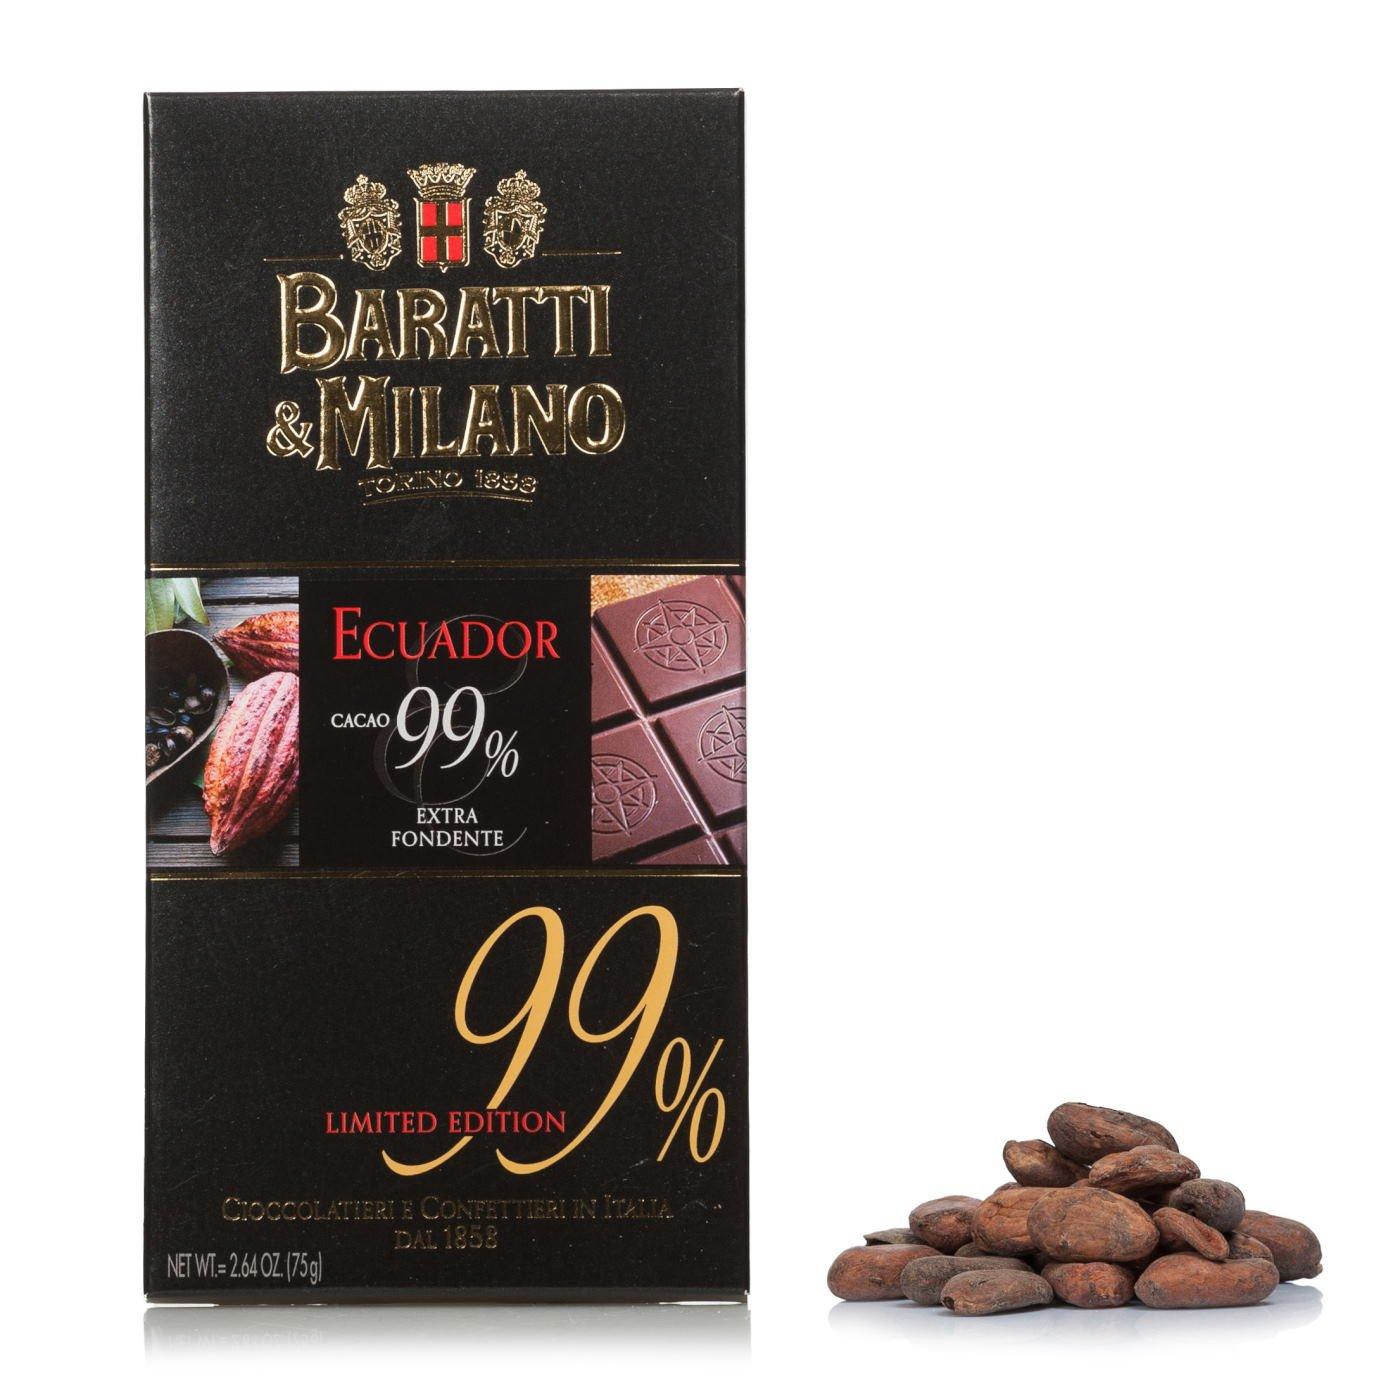 Tavoletta Extra Fondente Ecuador 99% 75g - Baratti & Milano | Eataly